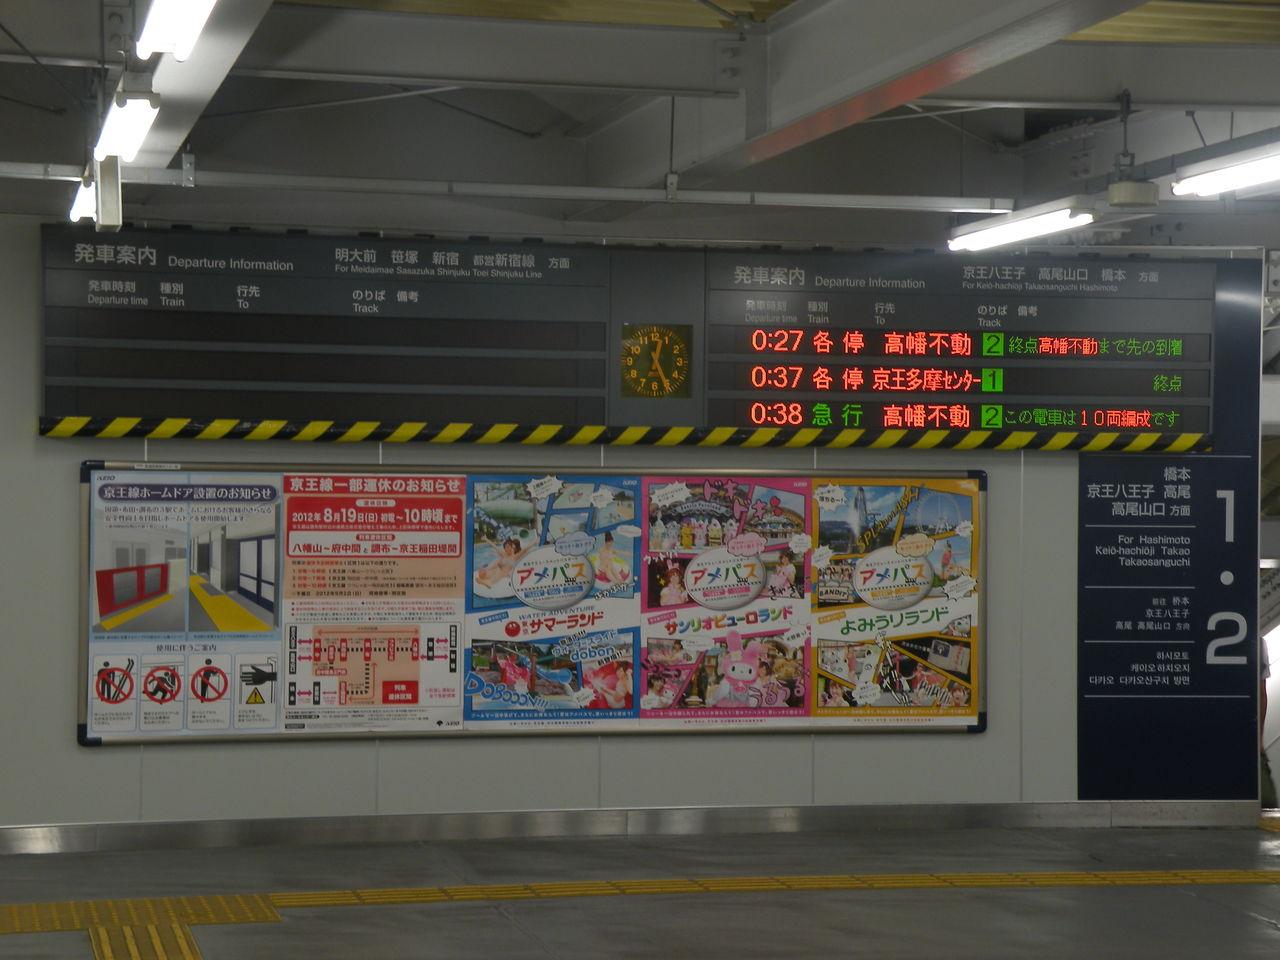 http://livedoor.blogimg.jp/w10330n/imgs/f/d/fd9e9fef.jpg